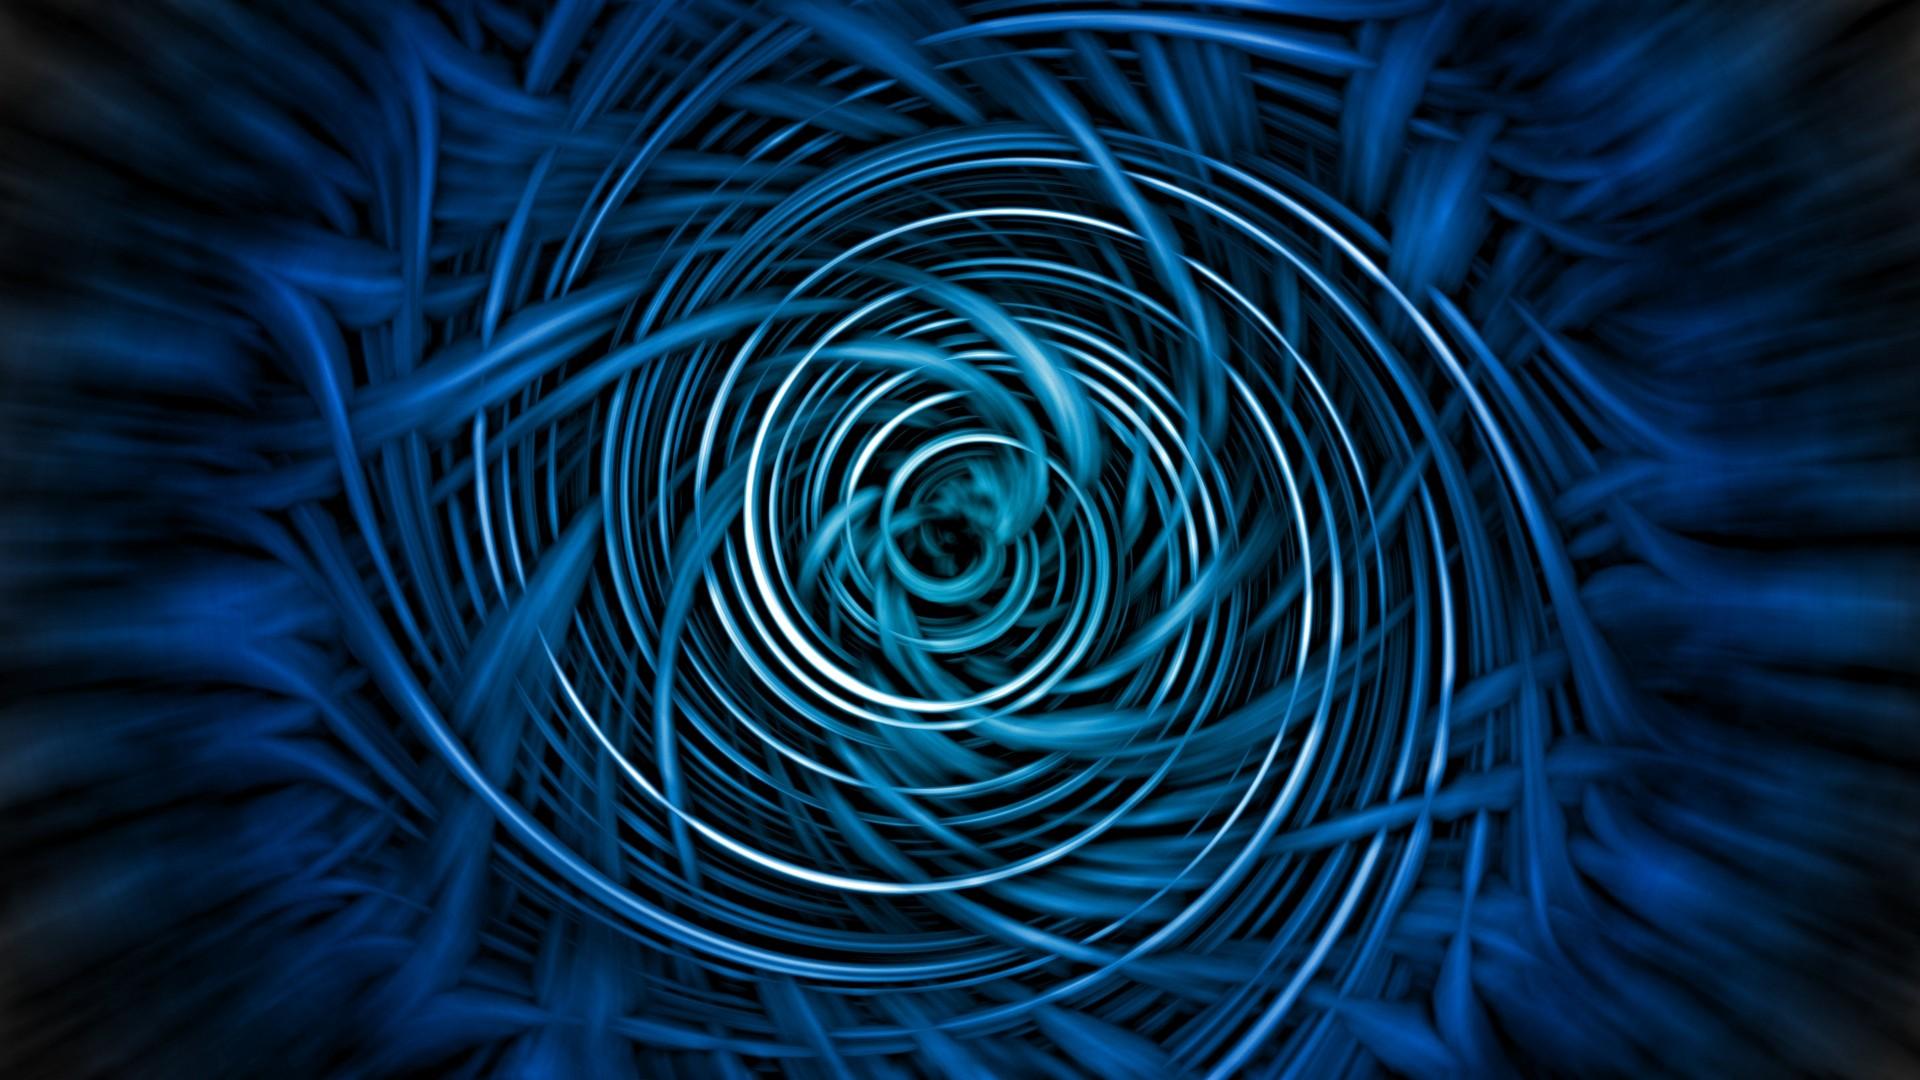 Download 3d Moving Wallpapers For Windows 7 Blue Spiral Desktop Wallpaper 60461 1920x1080 Px